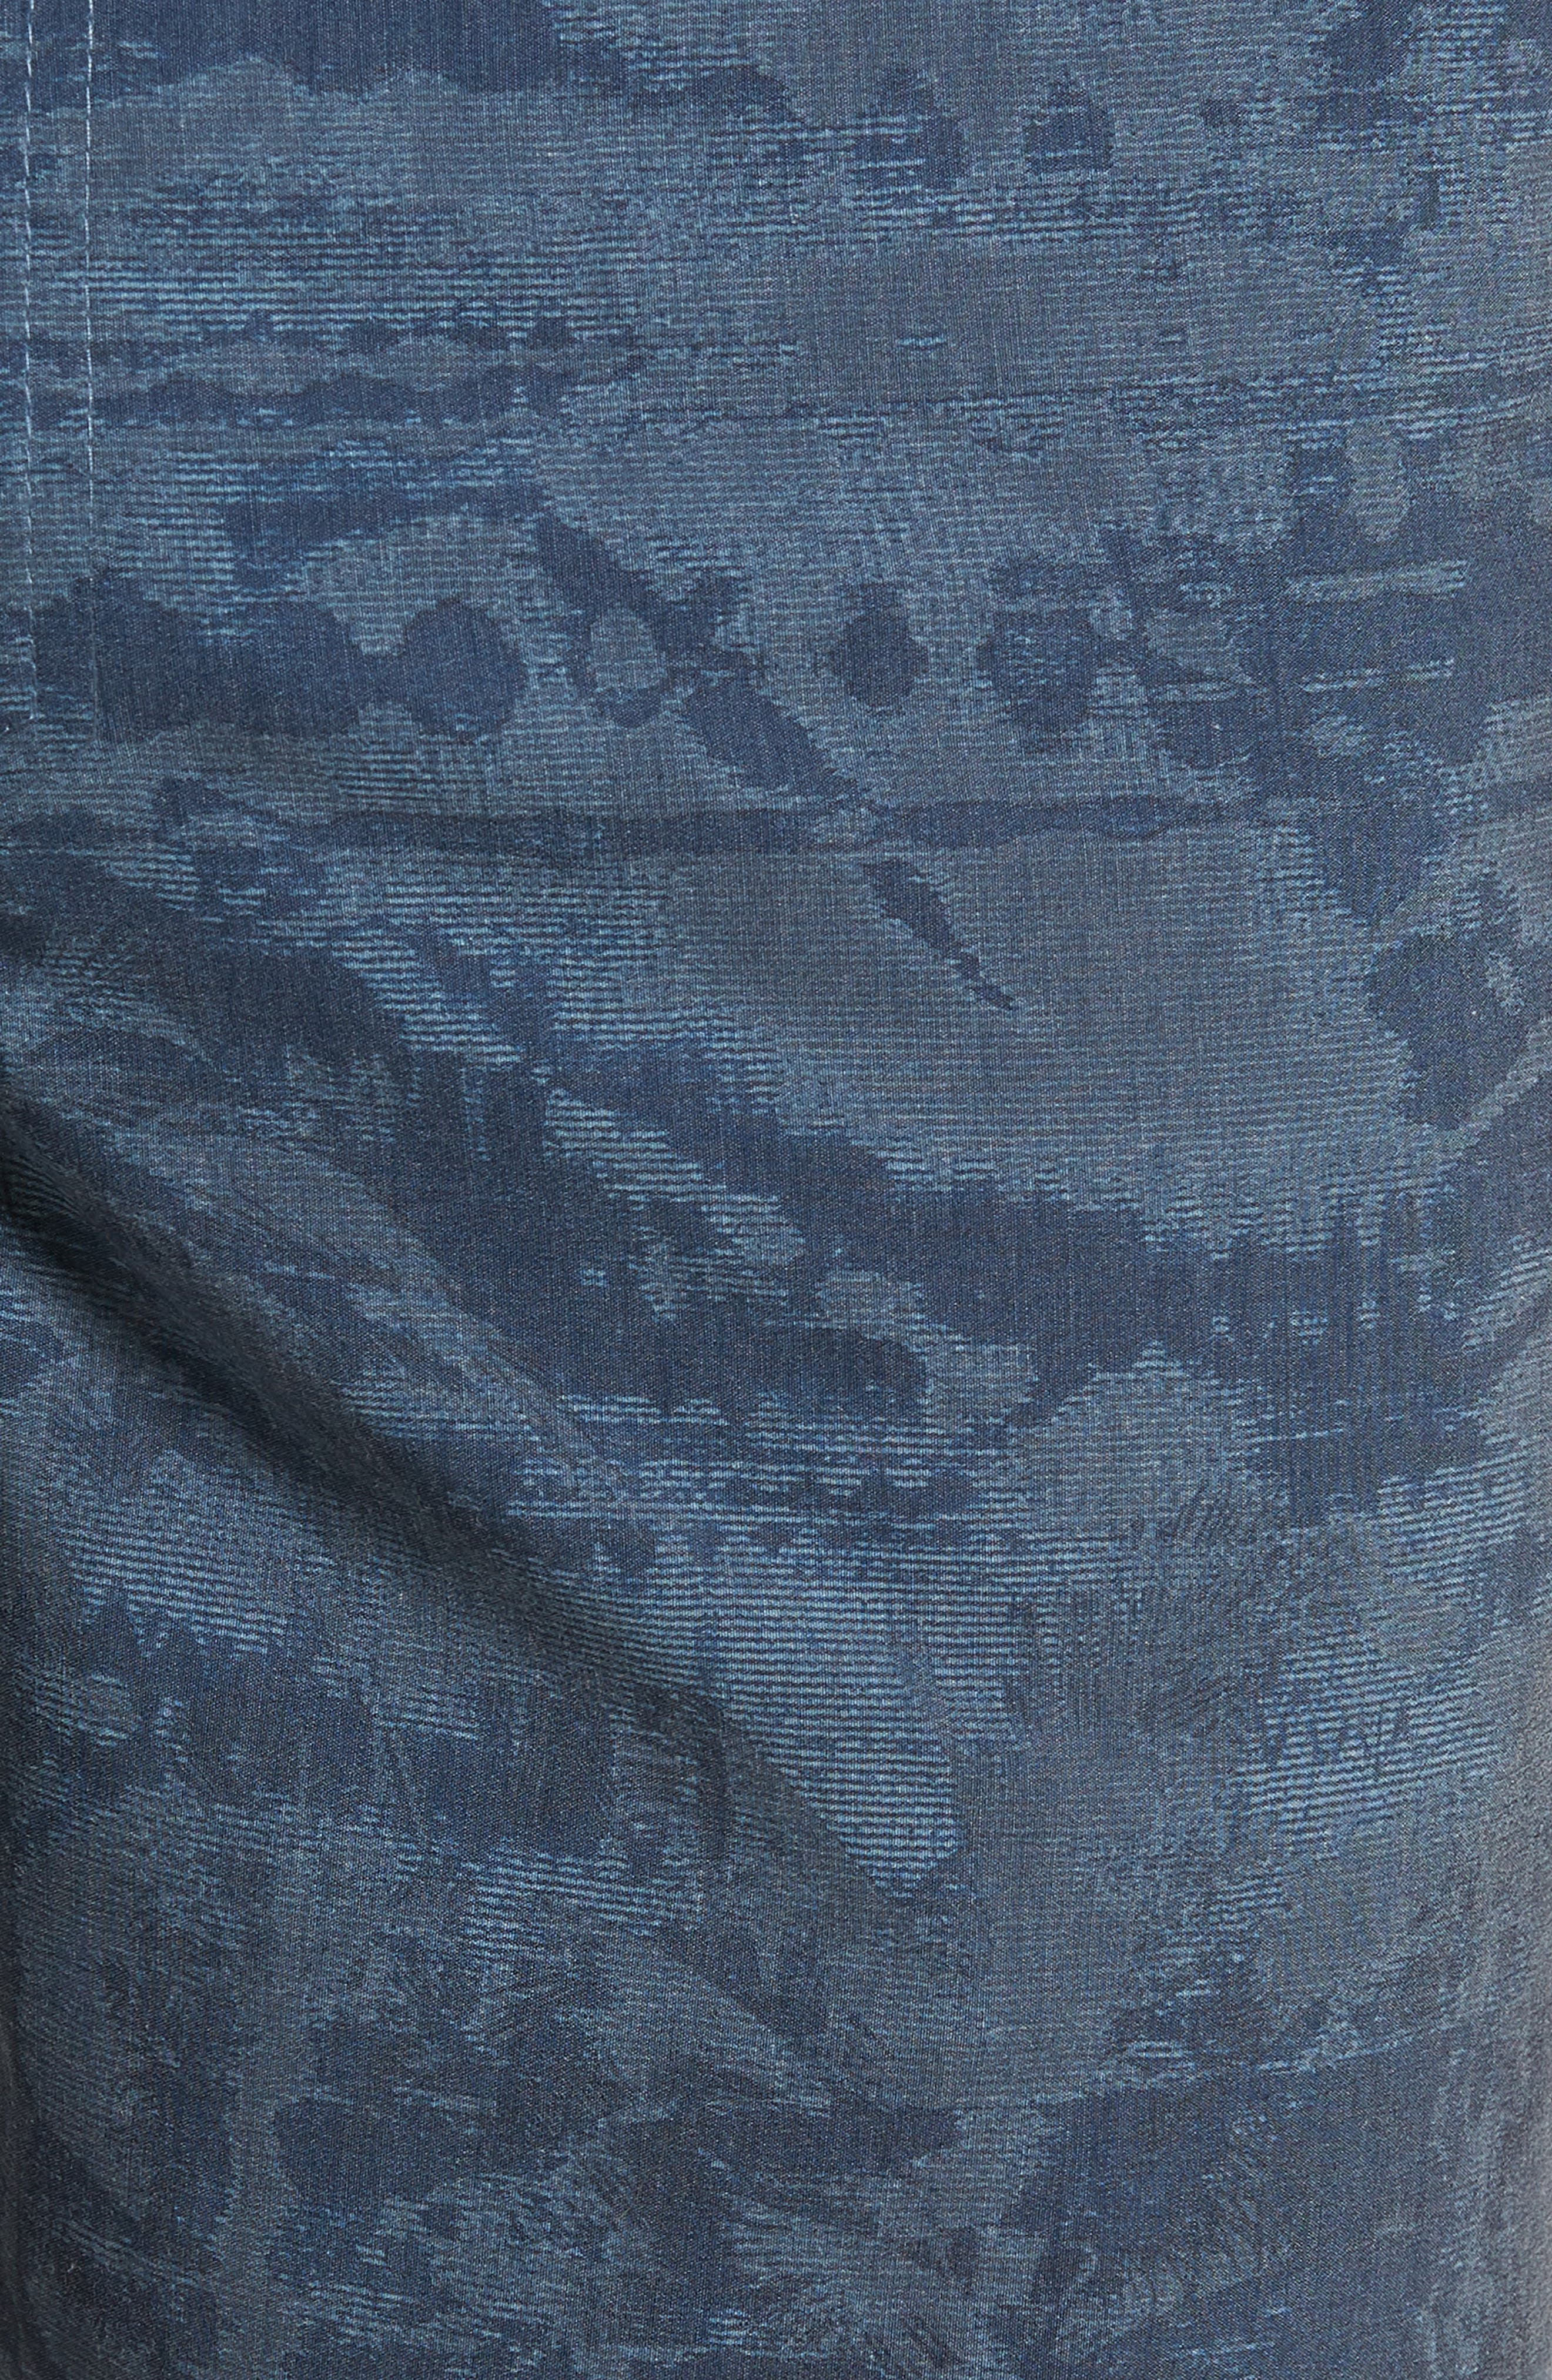 Mixed Hybrid Shorts,                             Alternate thumbnail 5, color,                             NAVY